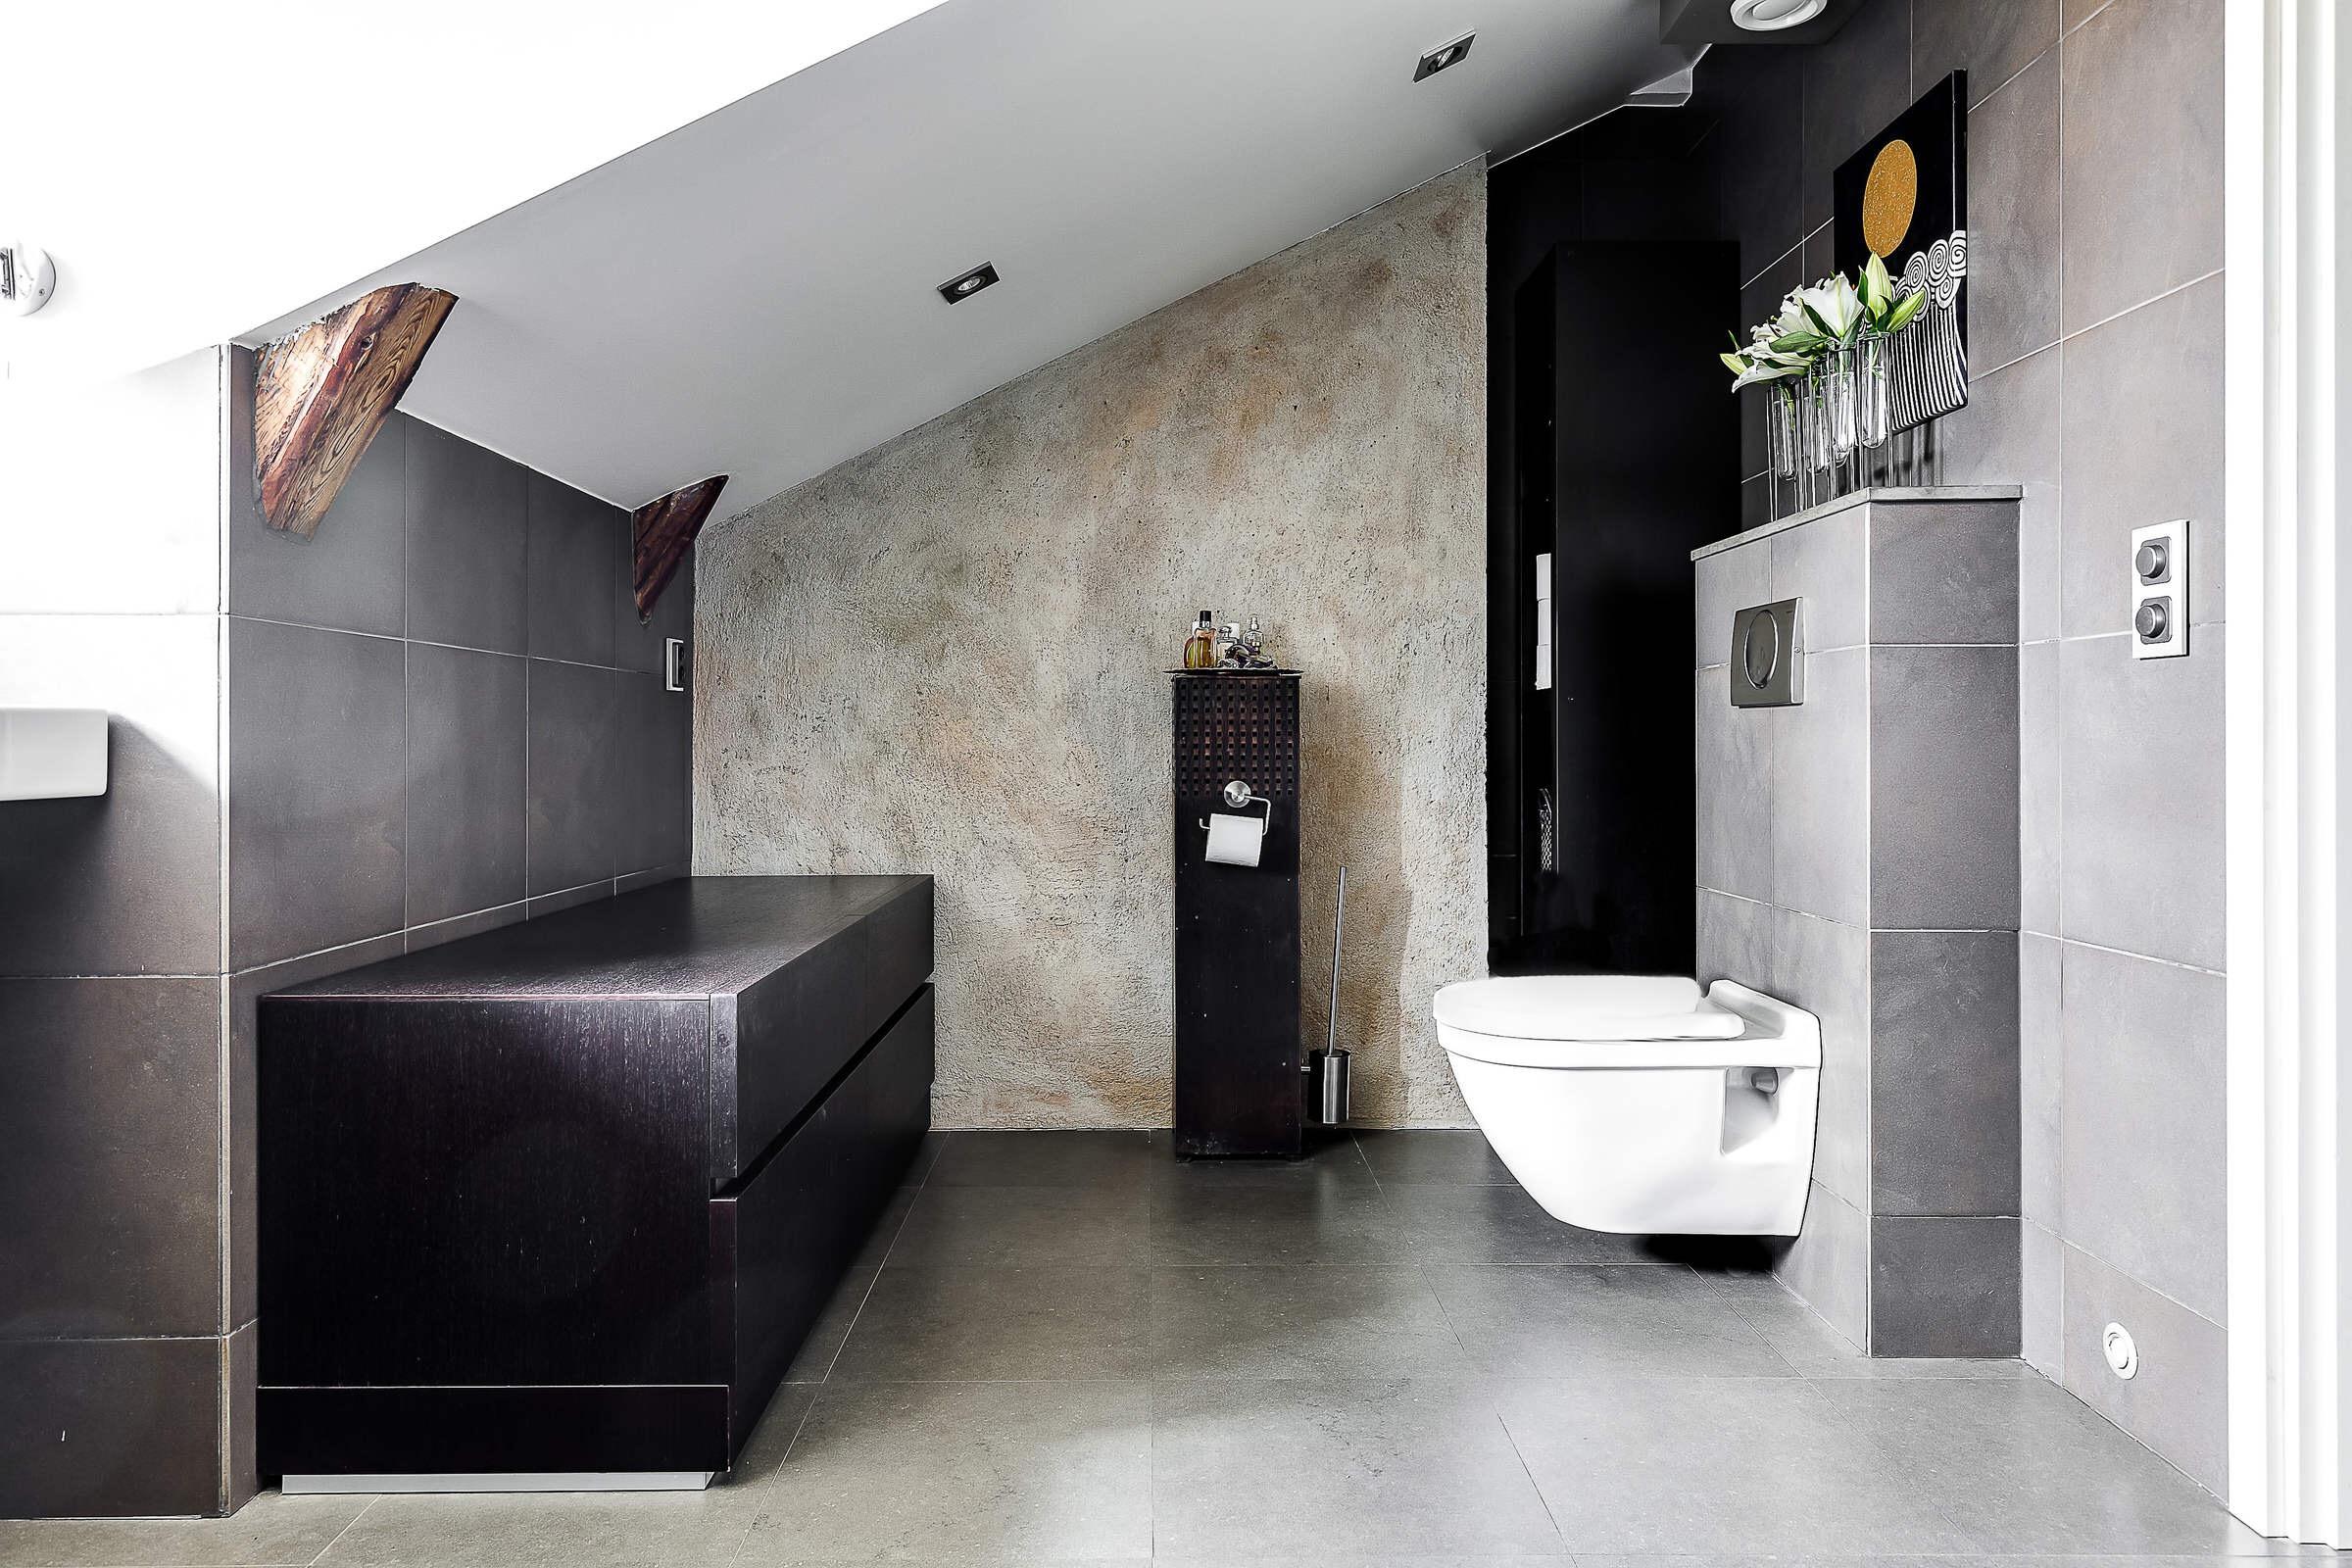 мансарда ванная комната подвесной унитаз